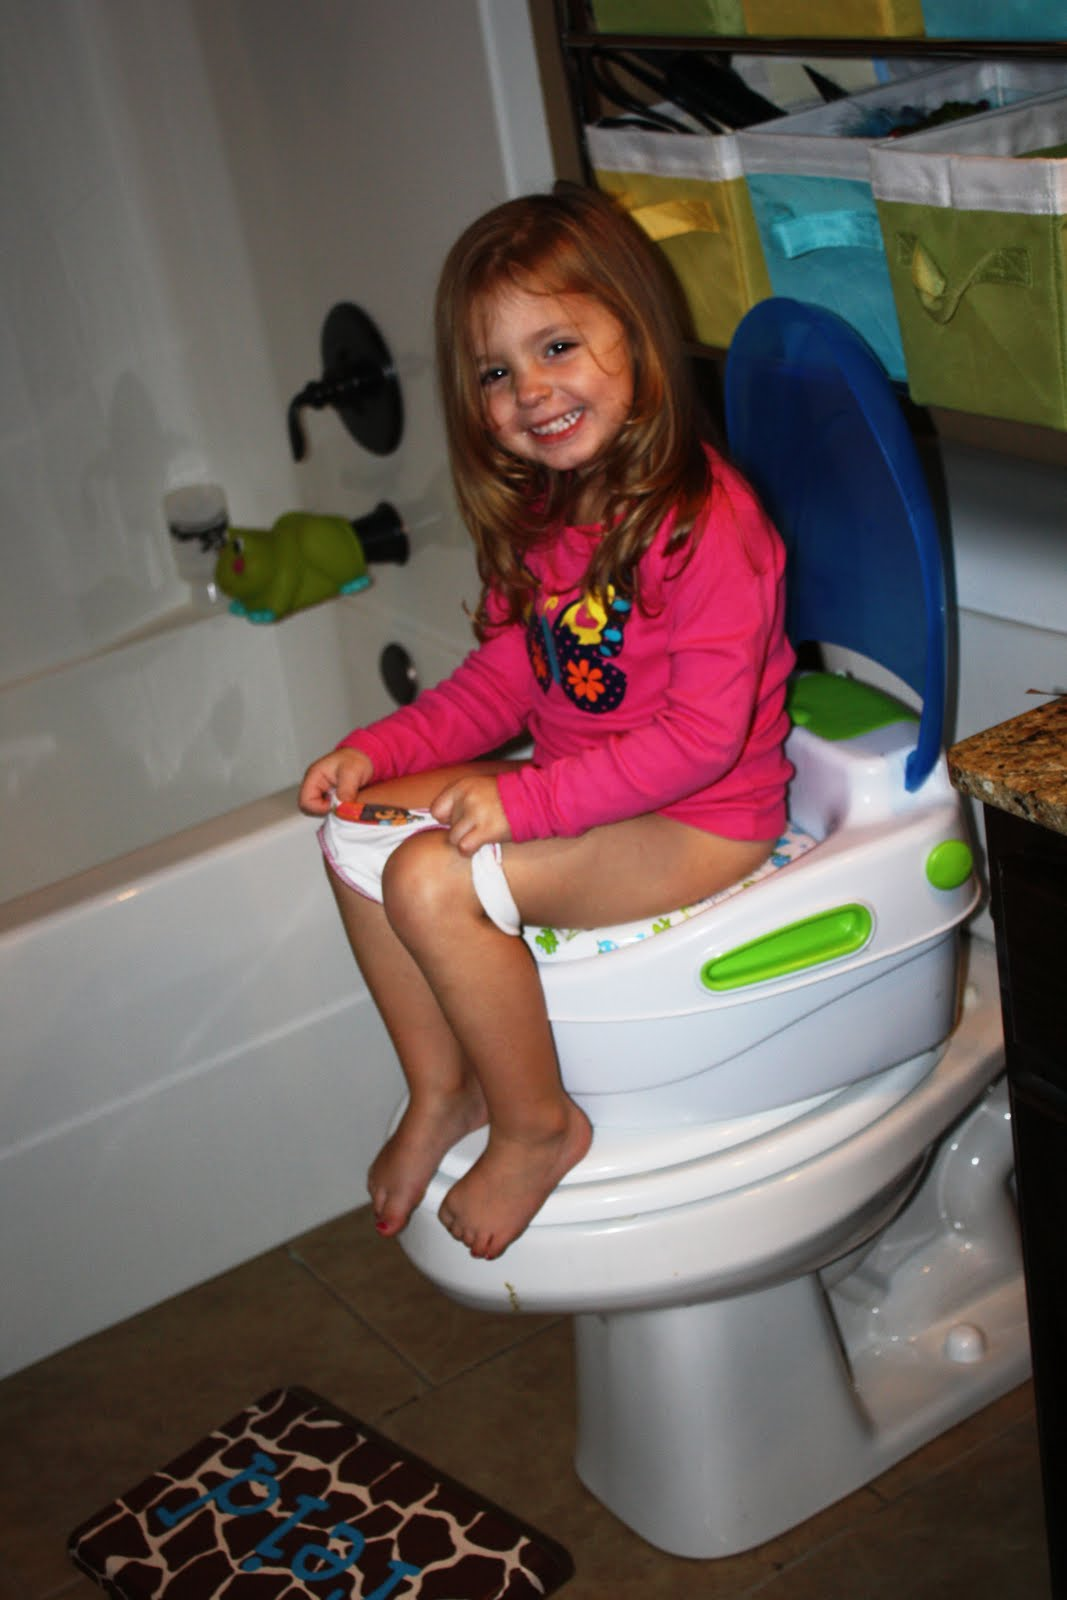 Best Toddler Toilet